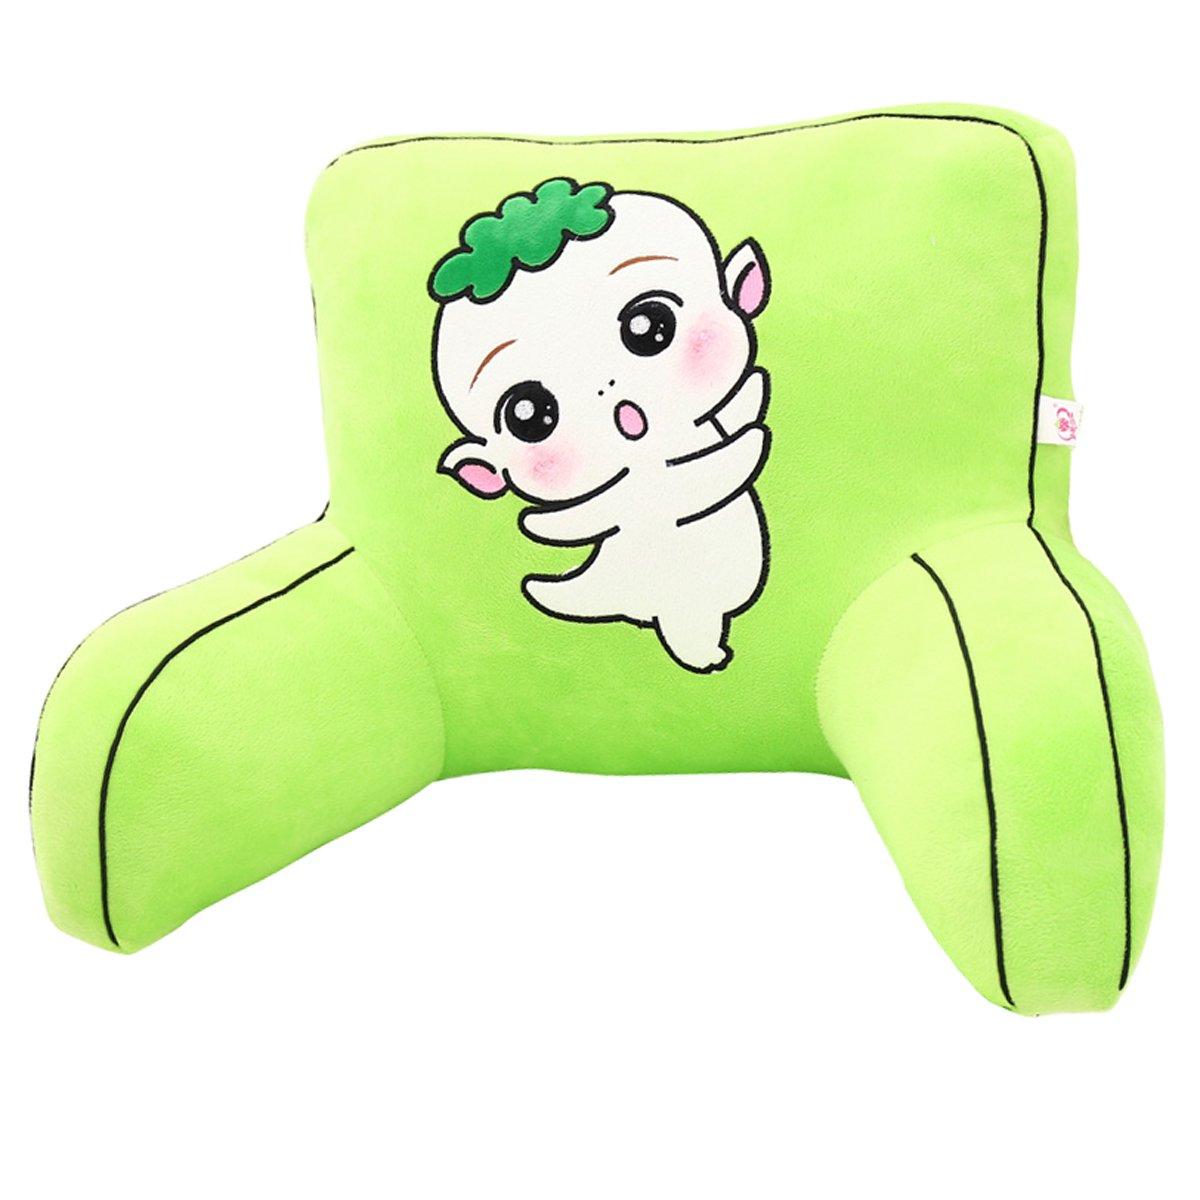 Adorable Green Radish Elves Lumbar Support Backrest Pillow Waist Seat Back Cushion Pillow in Home Office School Car